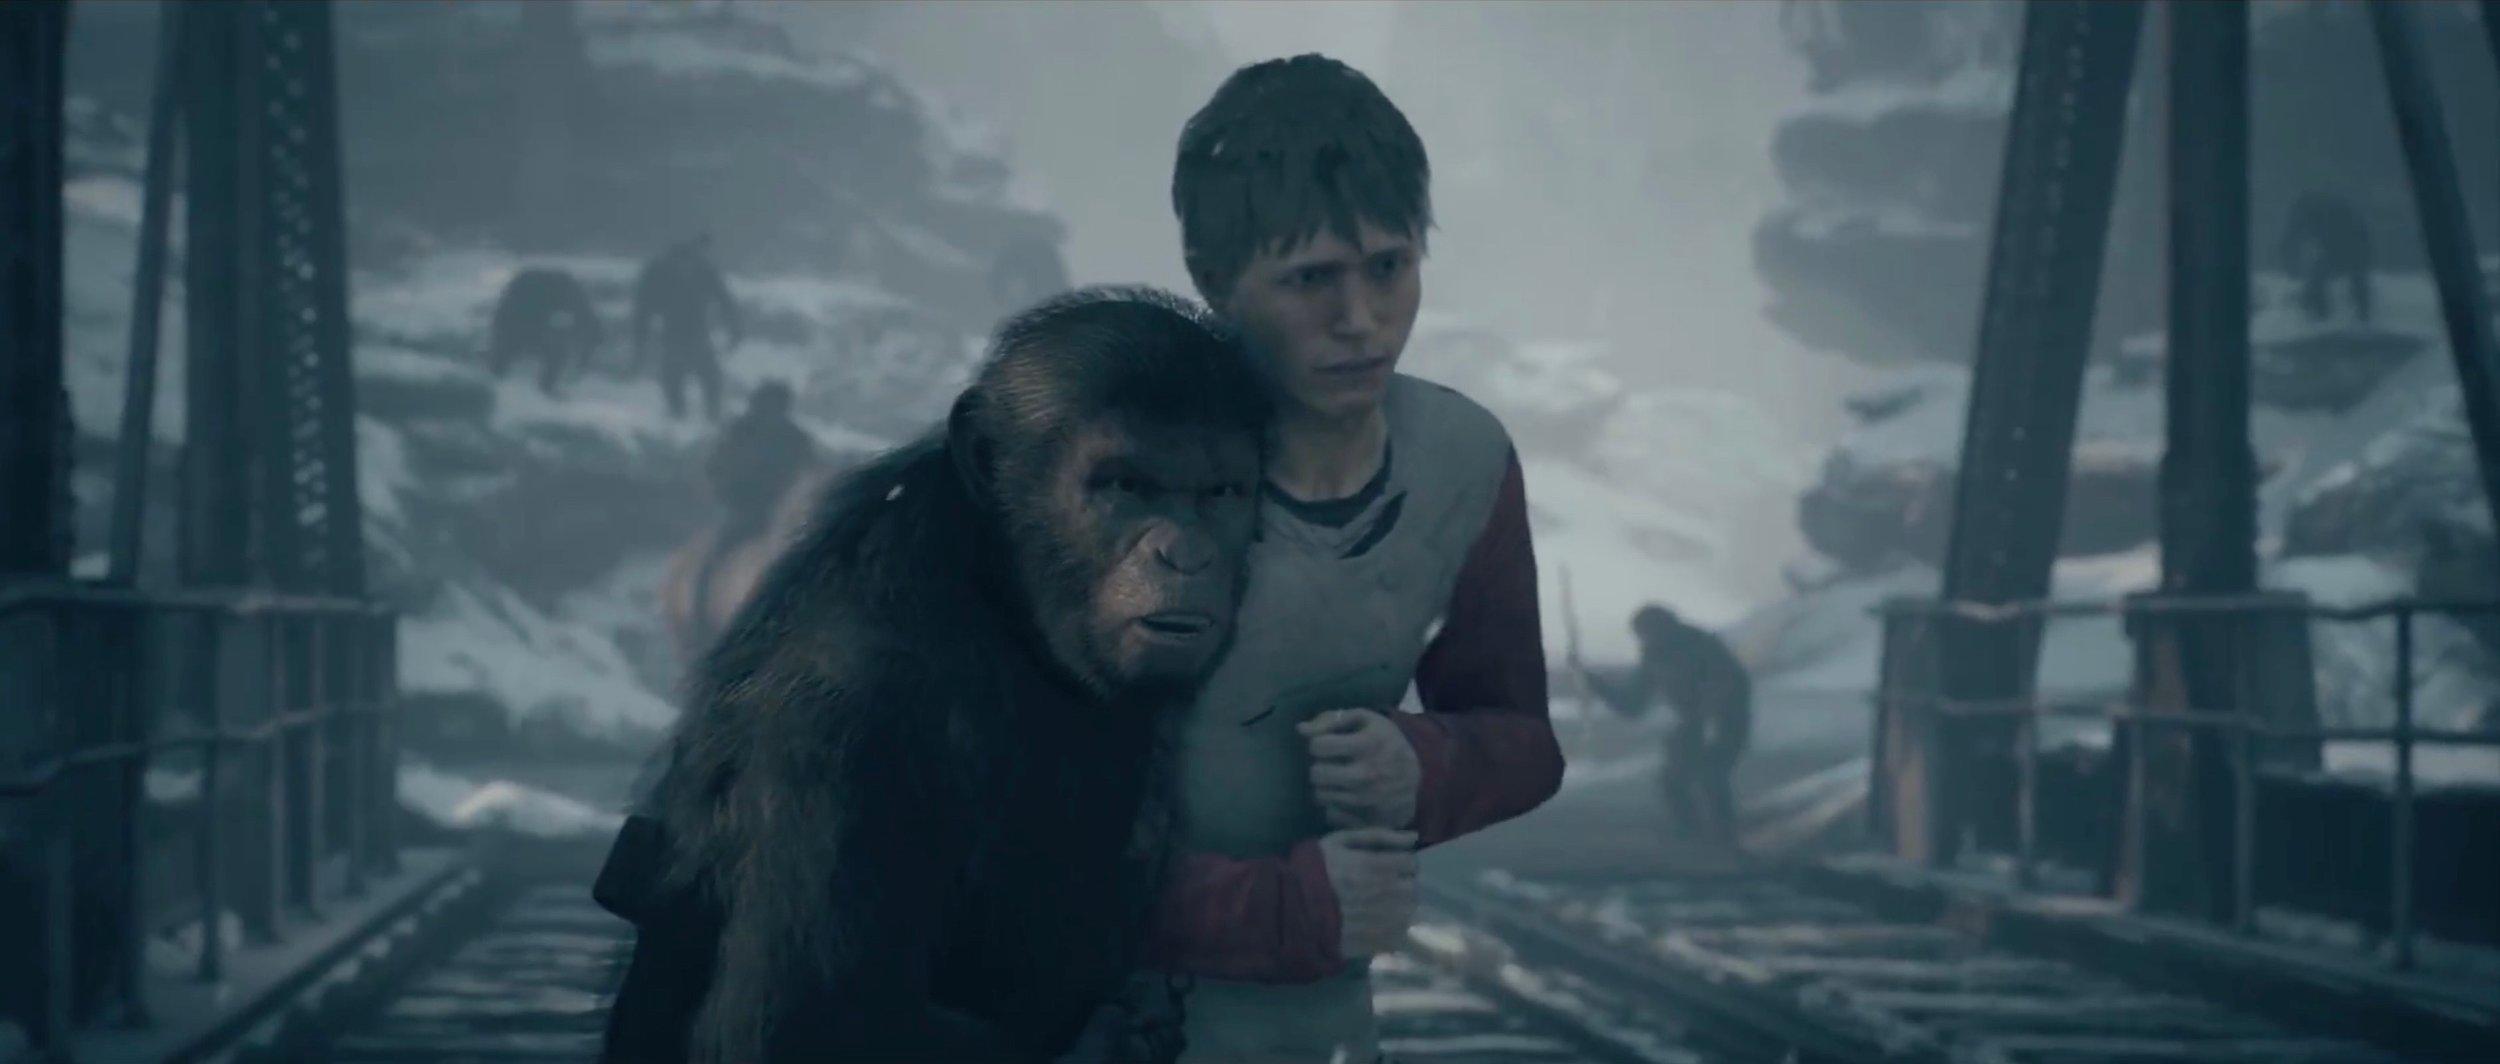 Neil Newbon as ape Bryn and Jassa Ahluwalia as Mark Ross